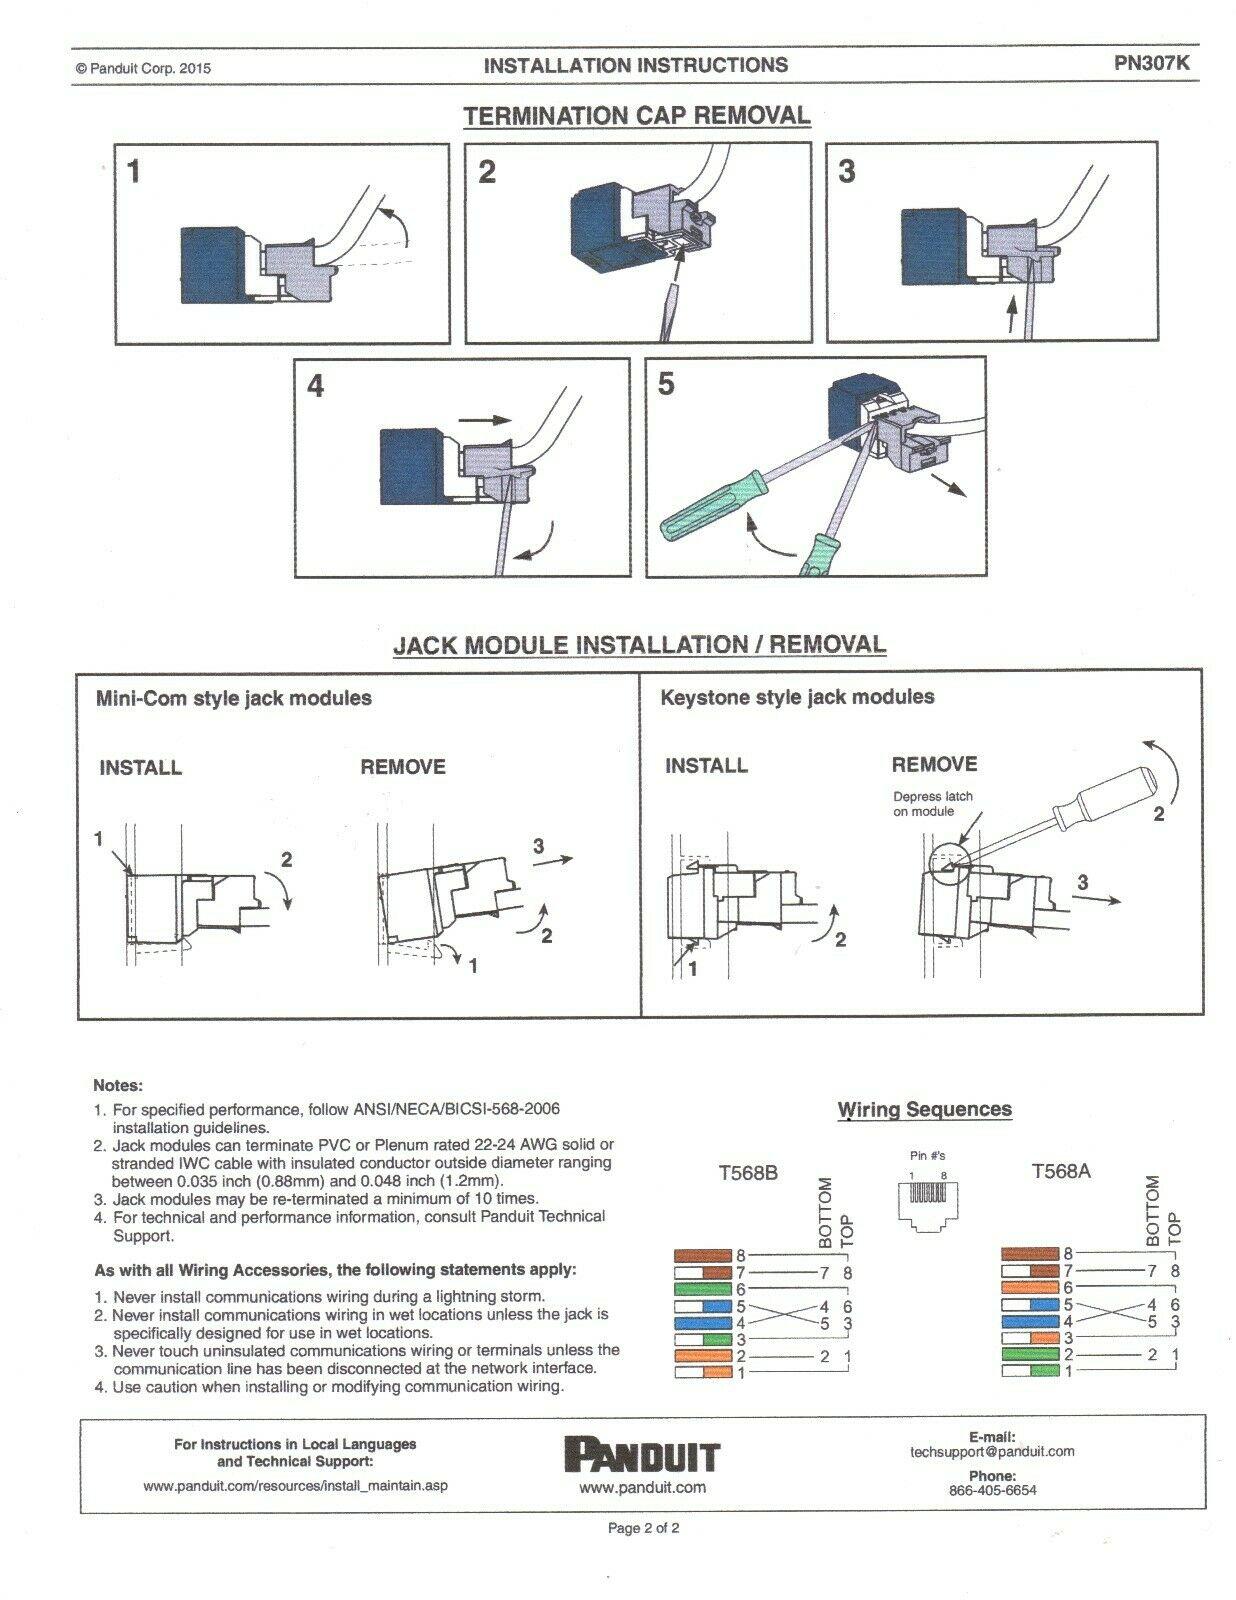 panduit rj11 wiring diagram cf 1712  panduit cat6 jack wiring diagram schematic wiring  panduit cat6 jack wiring diagram